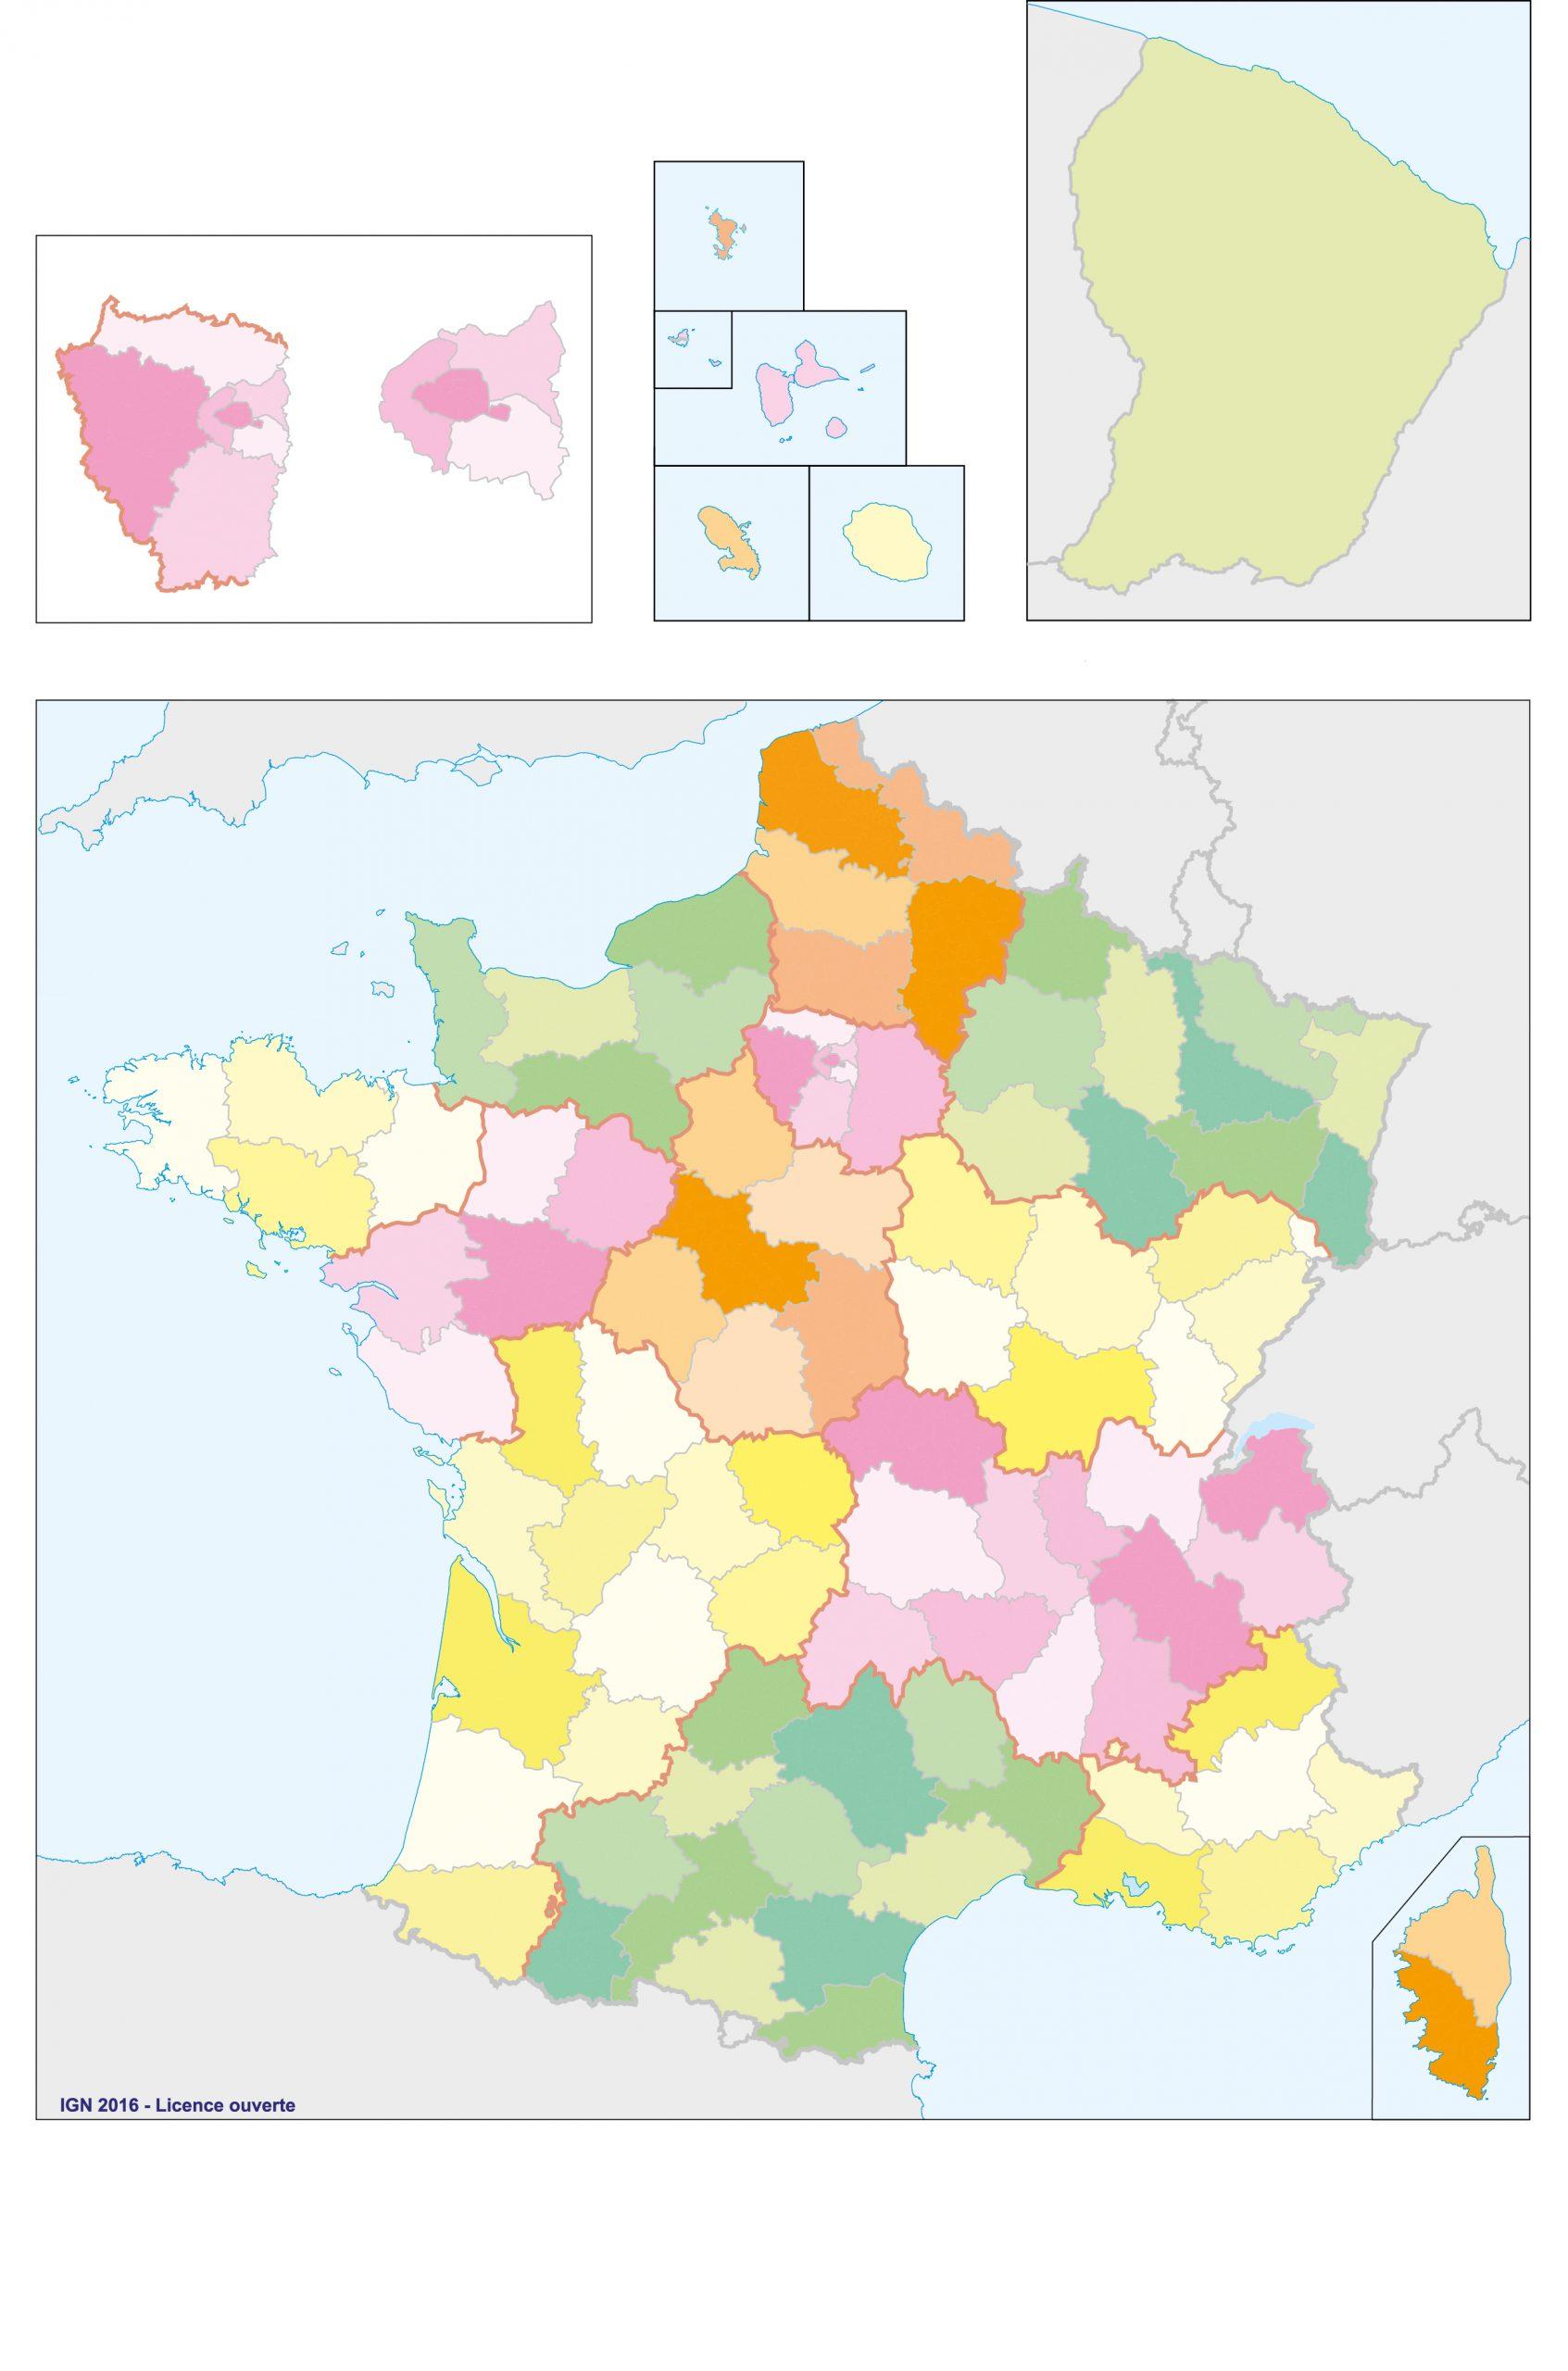 Fonds De Cartes De France, Ign | Webzine+ avec Carte Vierge De France